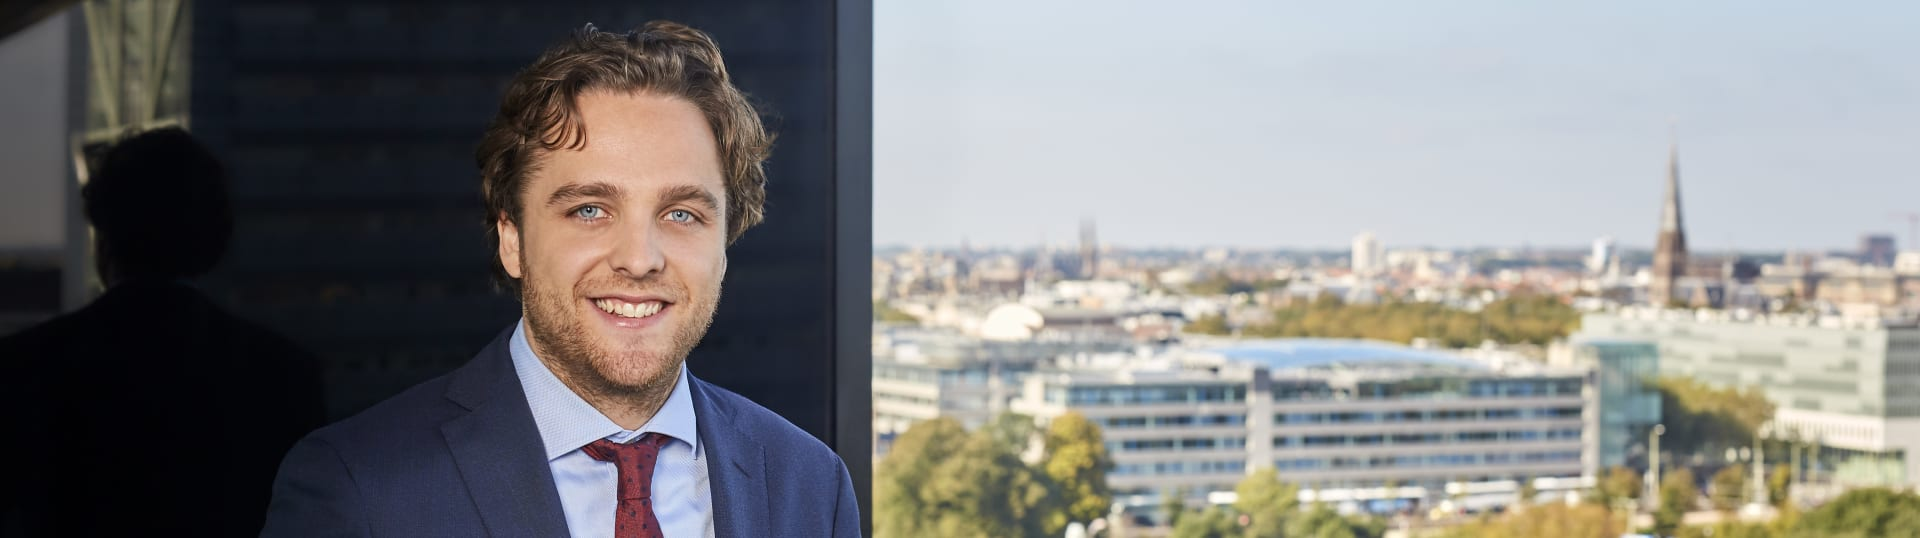 Sebastiaan Cnossen, advocaat Pels Rijcken